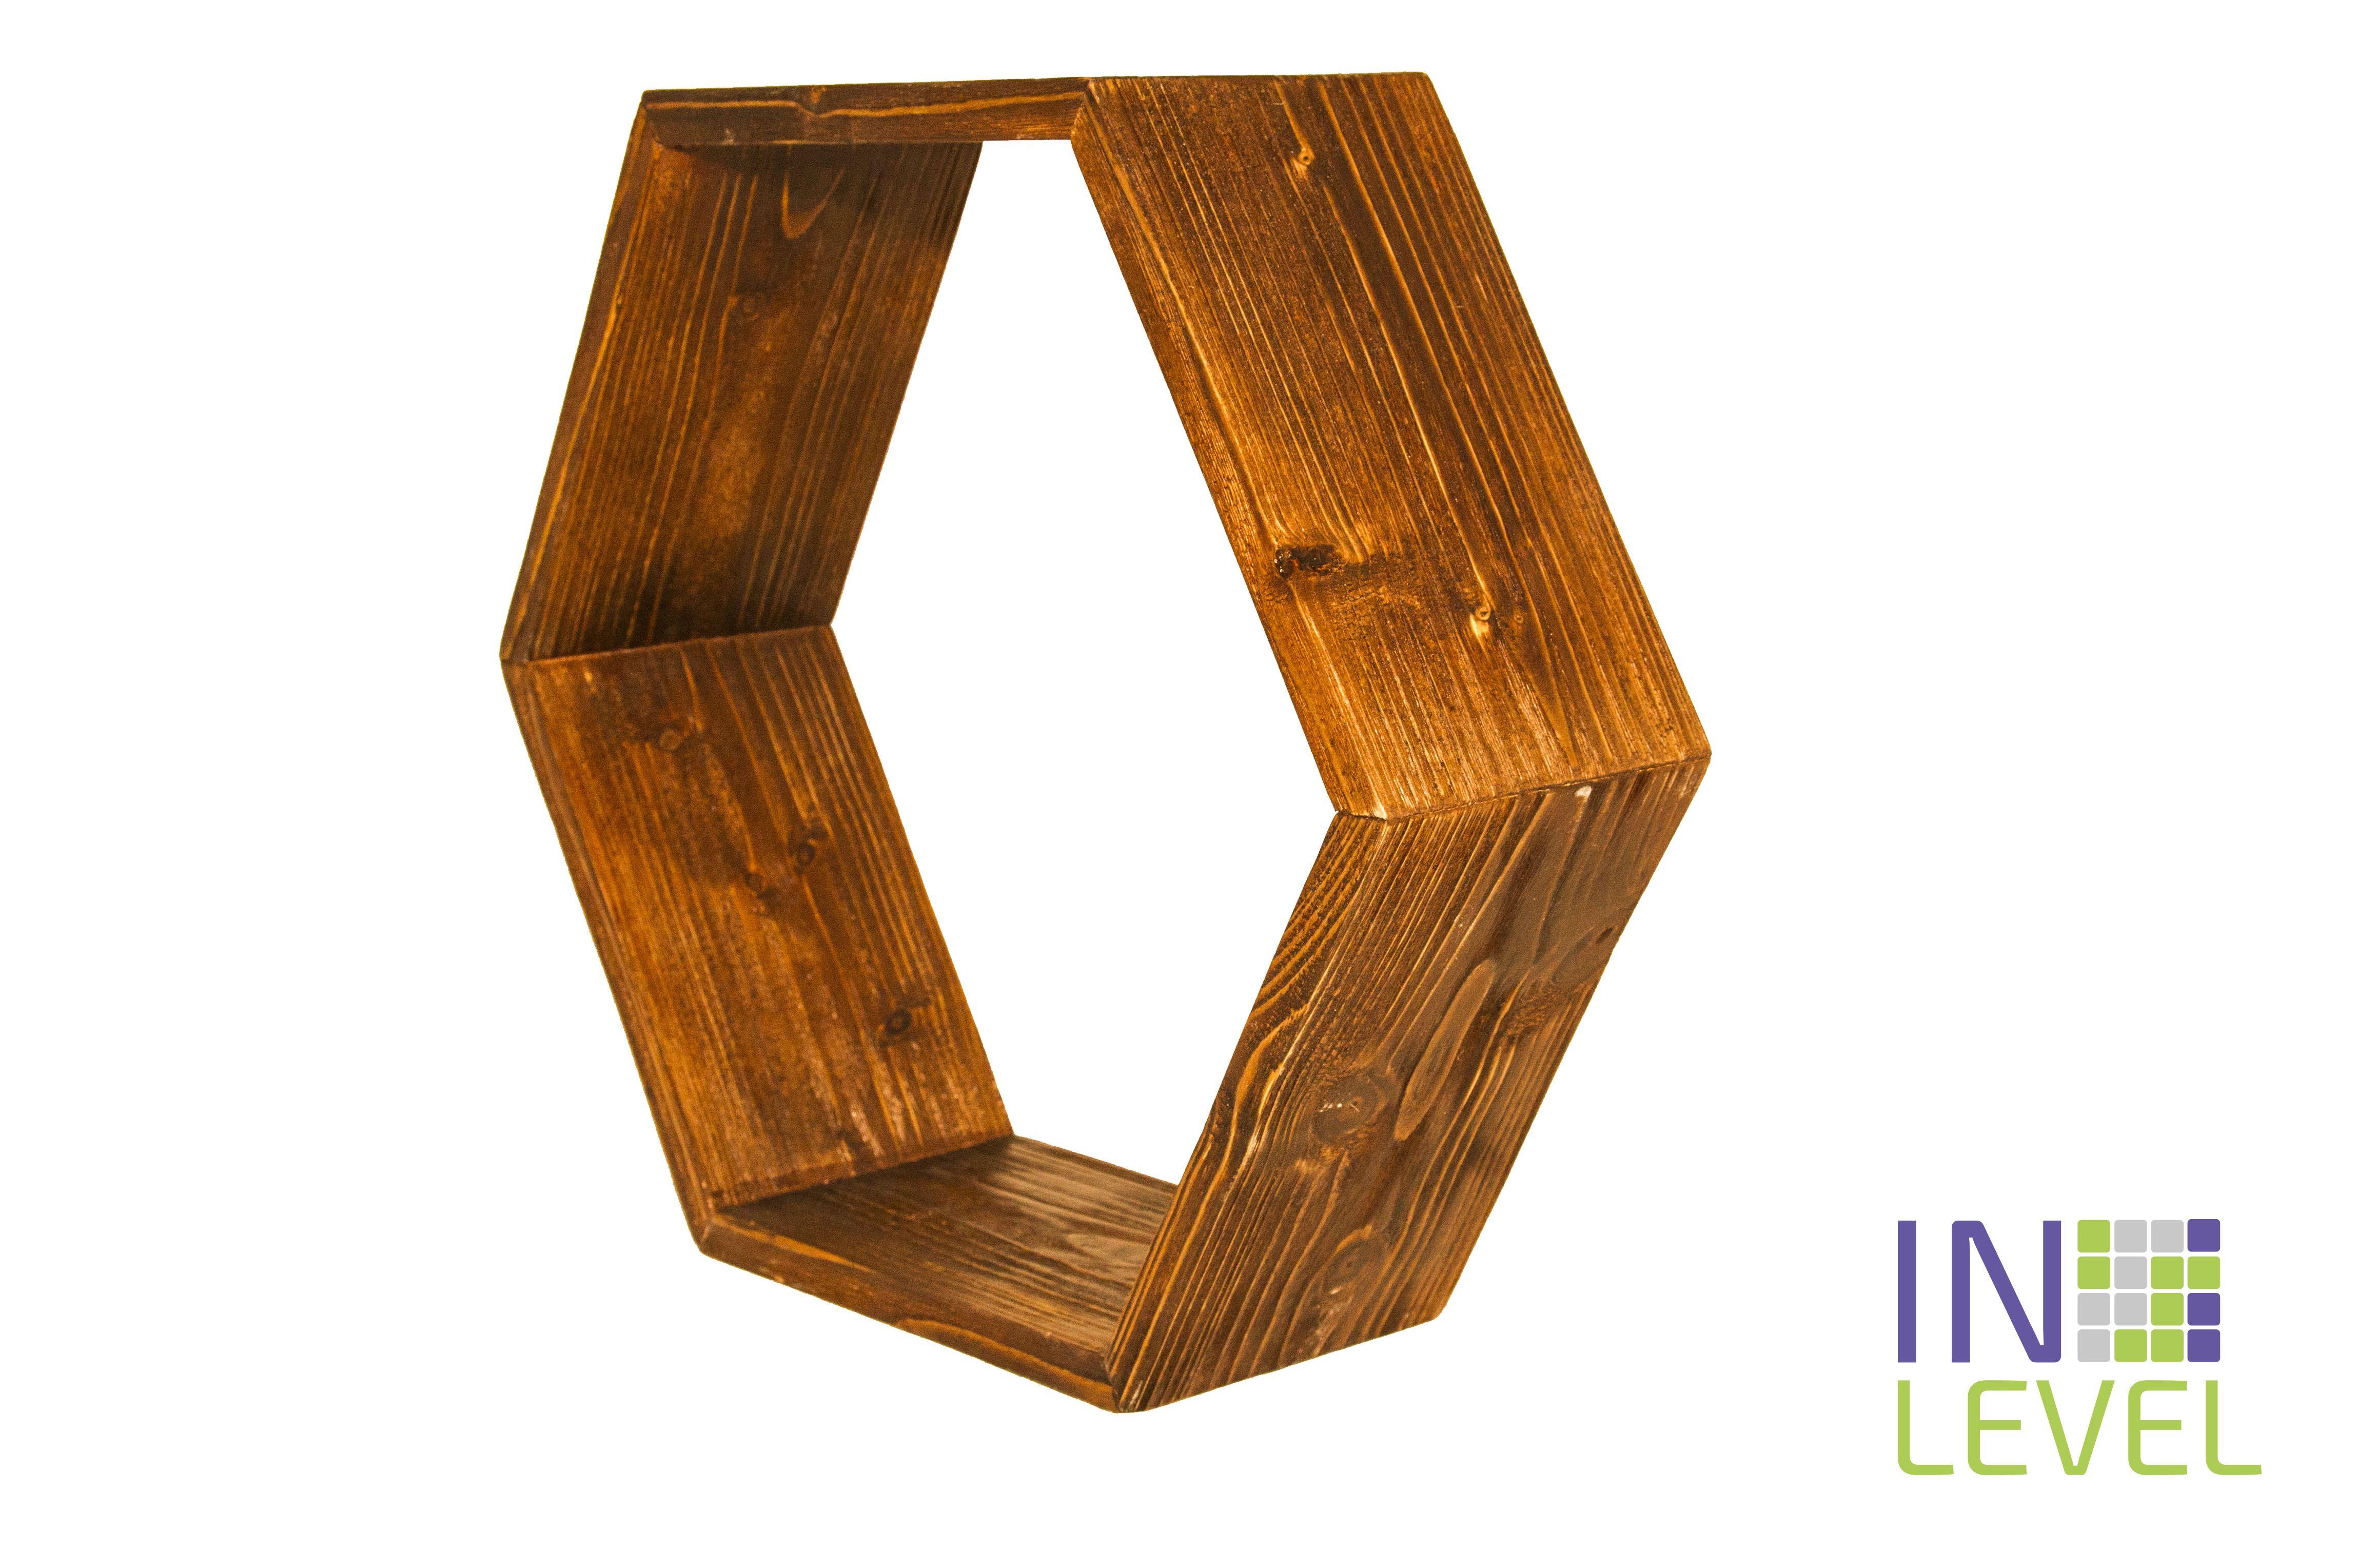 pine wood interior shelf